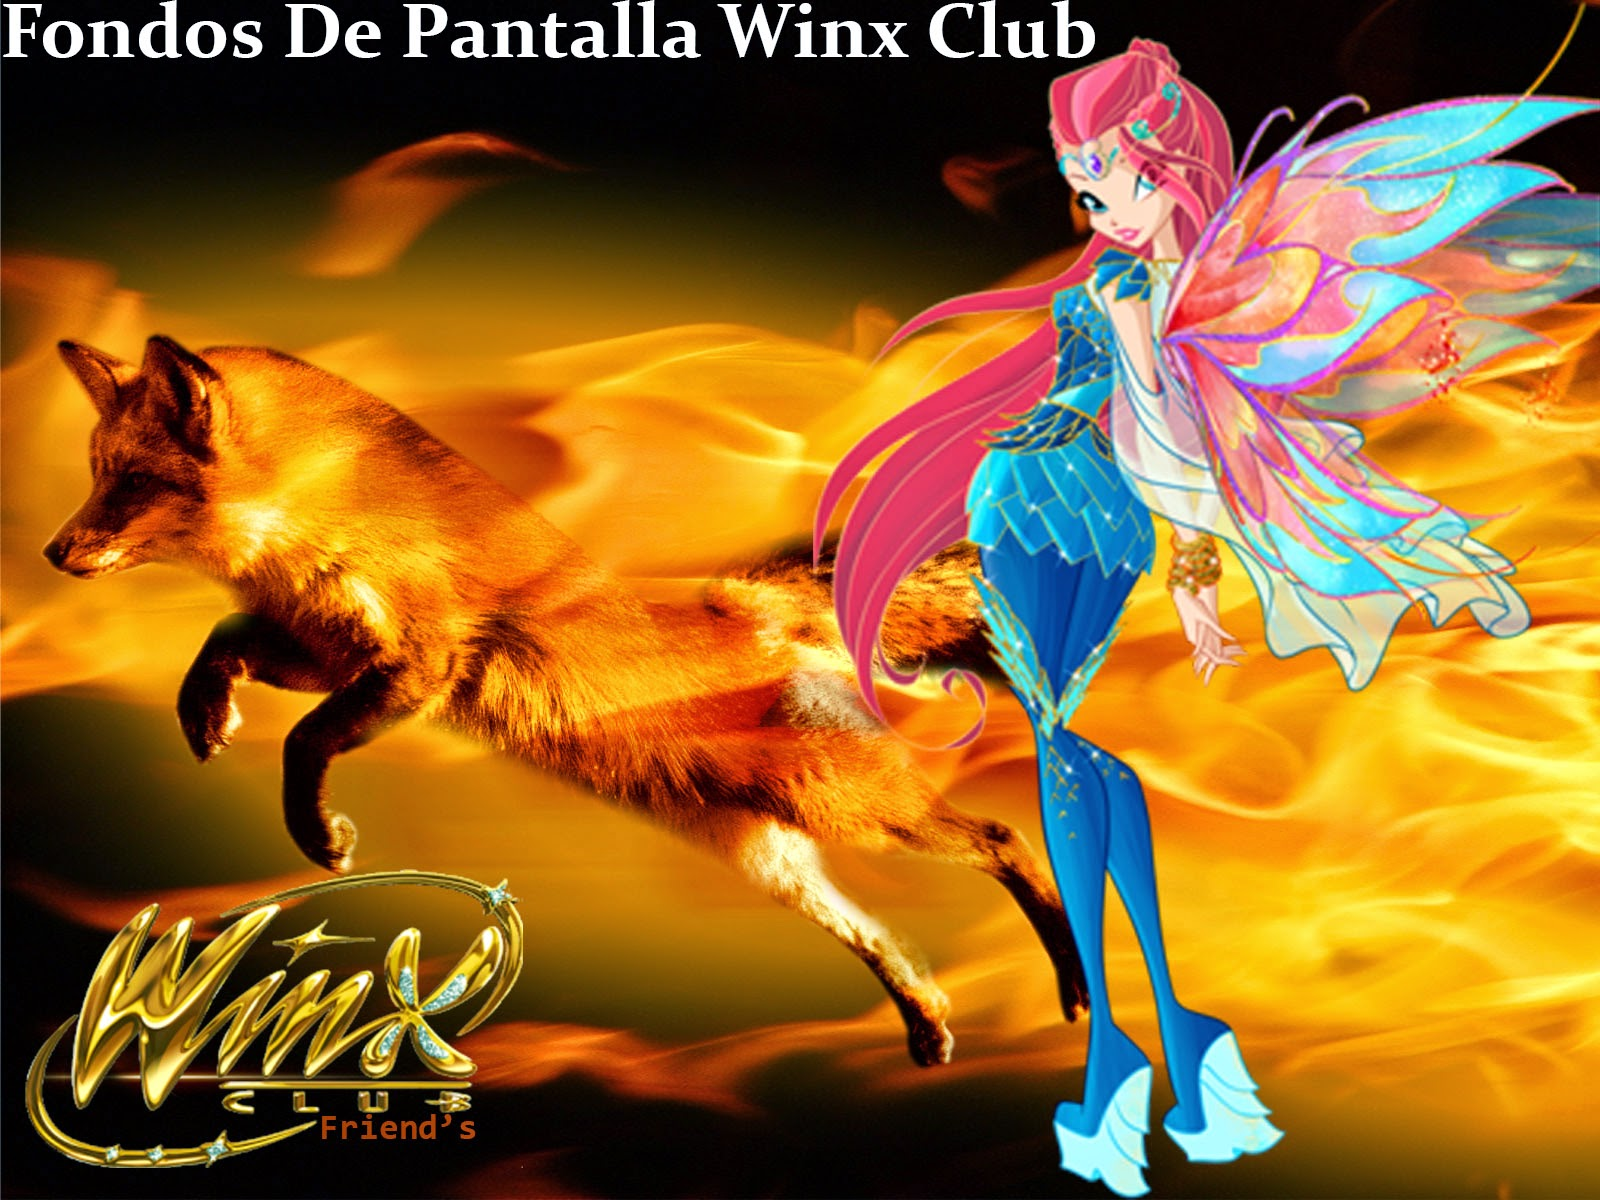 Winx Club Friends Fondos De Pantalla Winx Club